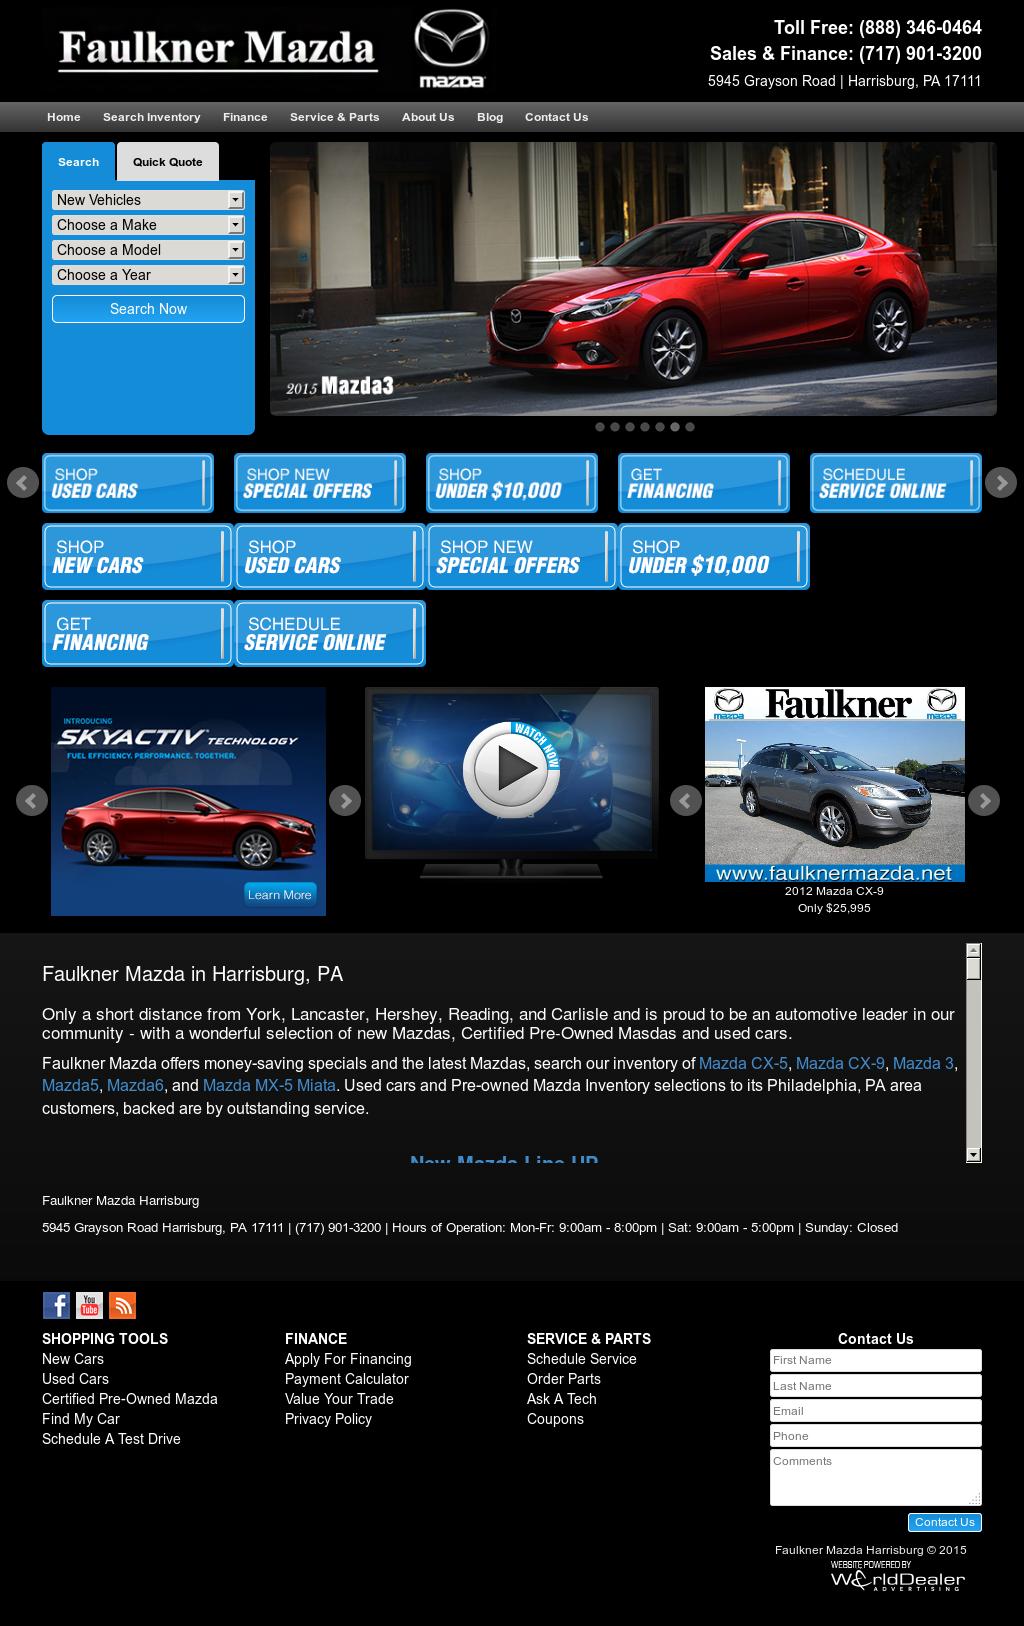 Faulkner Mazda Competitors, Revenue And Employees   Owler Company Profile